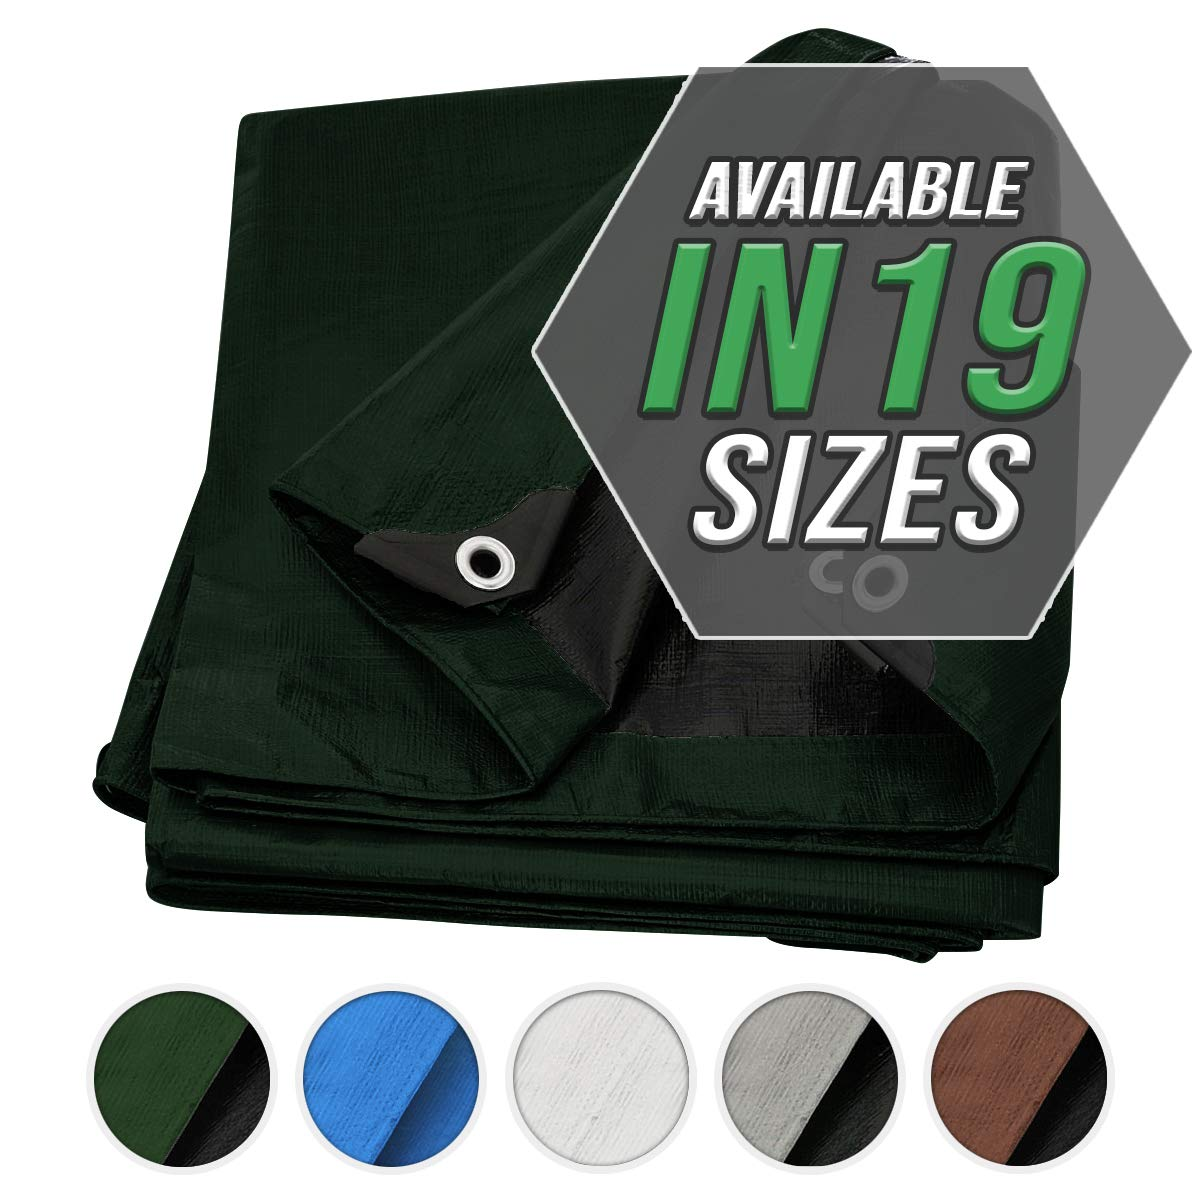 Great for Tarpaulin Canopy Tent Boat Waterproof Heavy Duty Poly Tarp Brown//Black Tarp Cover Brown//Black Heavy Duty Thick Material RV Or Pool Cover